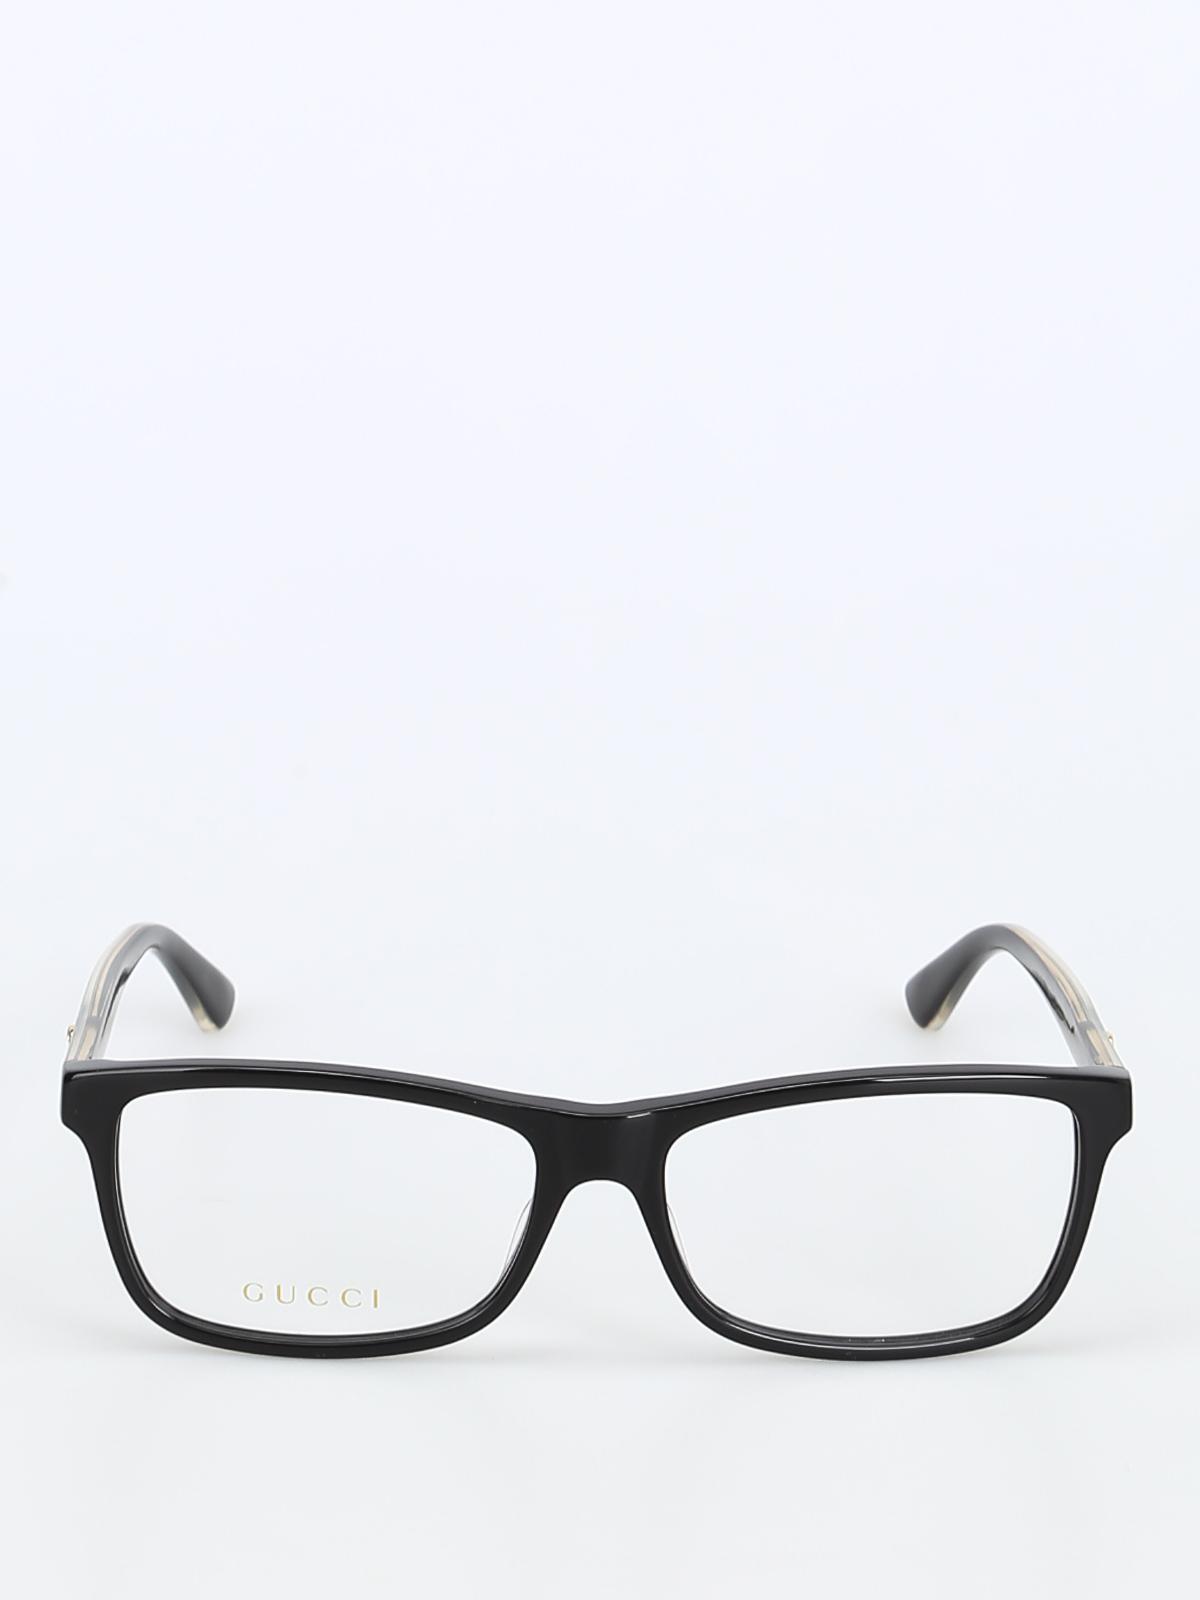 46b39957e889e iKRIX GUCCI  Glasses - Acetate black eyeglasses with golden details